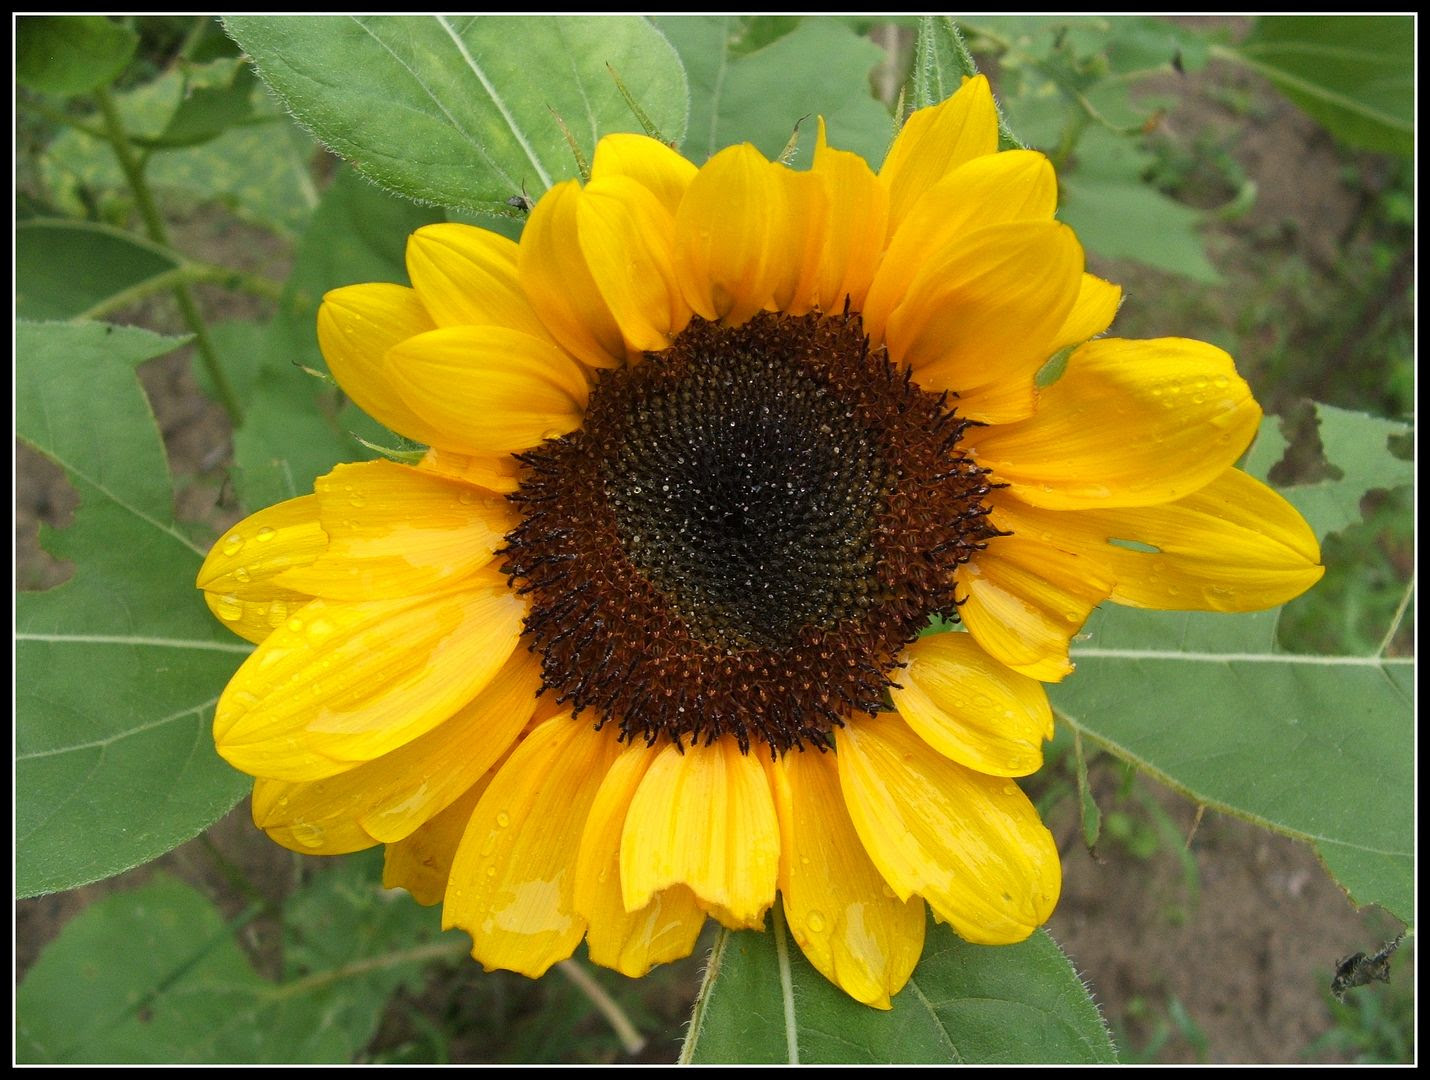 by Angie Ouellette-Tower for http://www.godsgrowinggarden.com/ photo DSCF8081_zpsmllt3kum.jpg